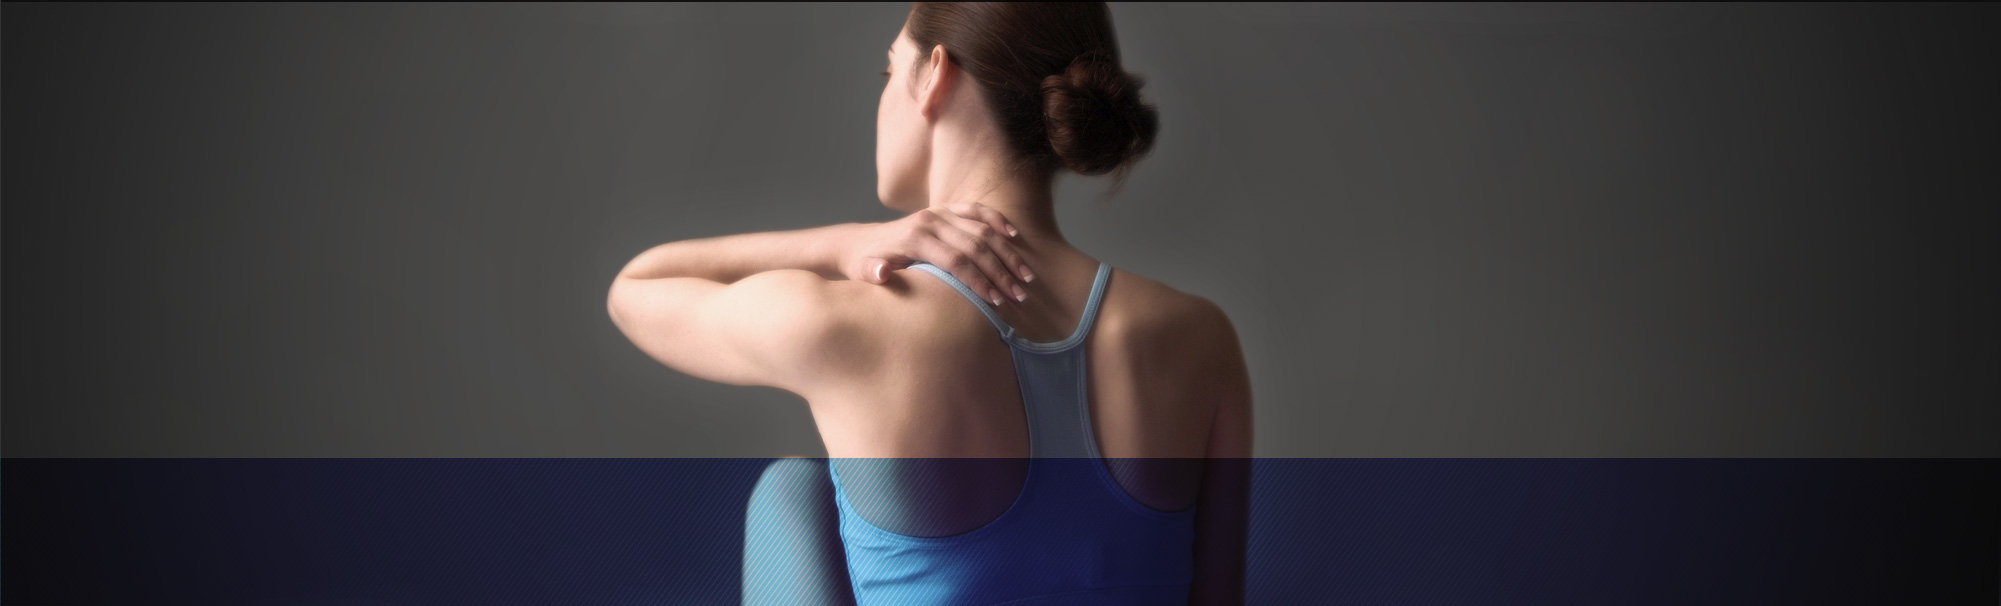 JMR-sliders-yoga